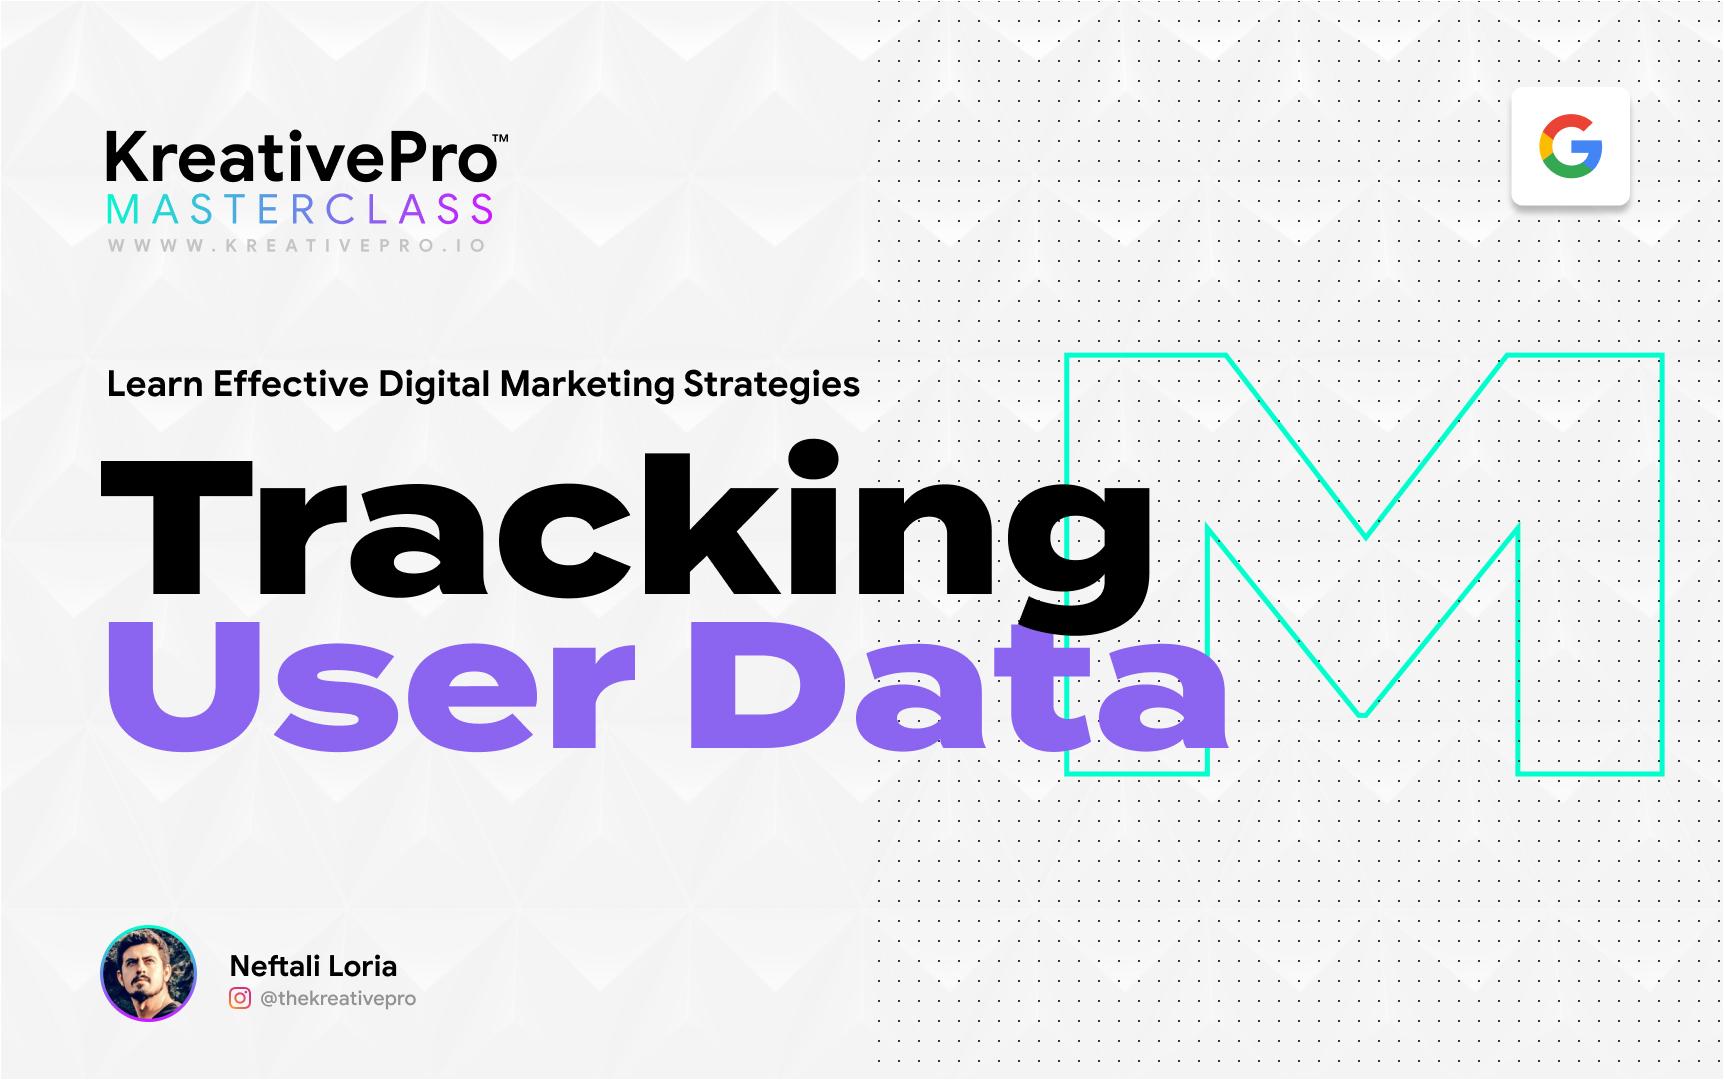 Marketing 2.4 - Tracking User Data